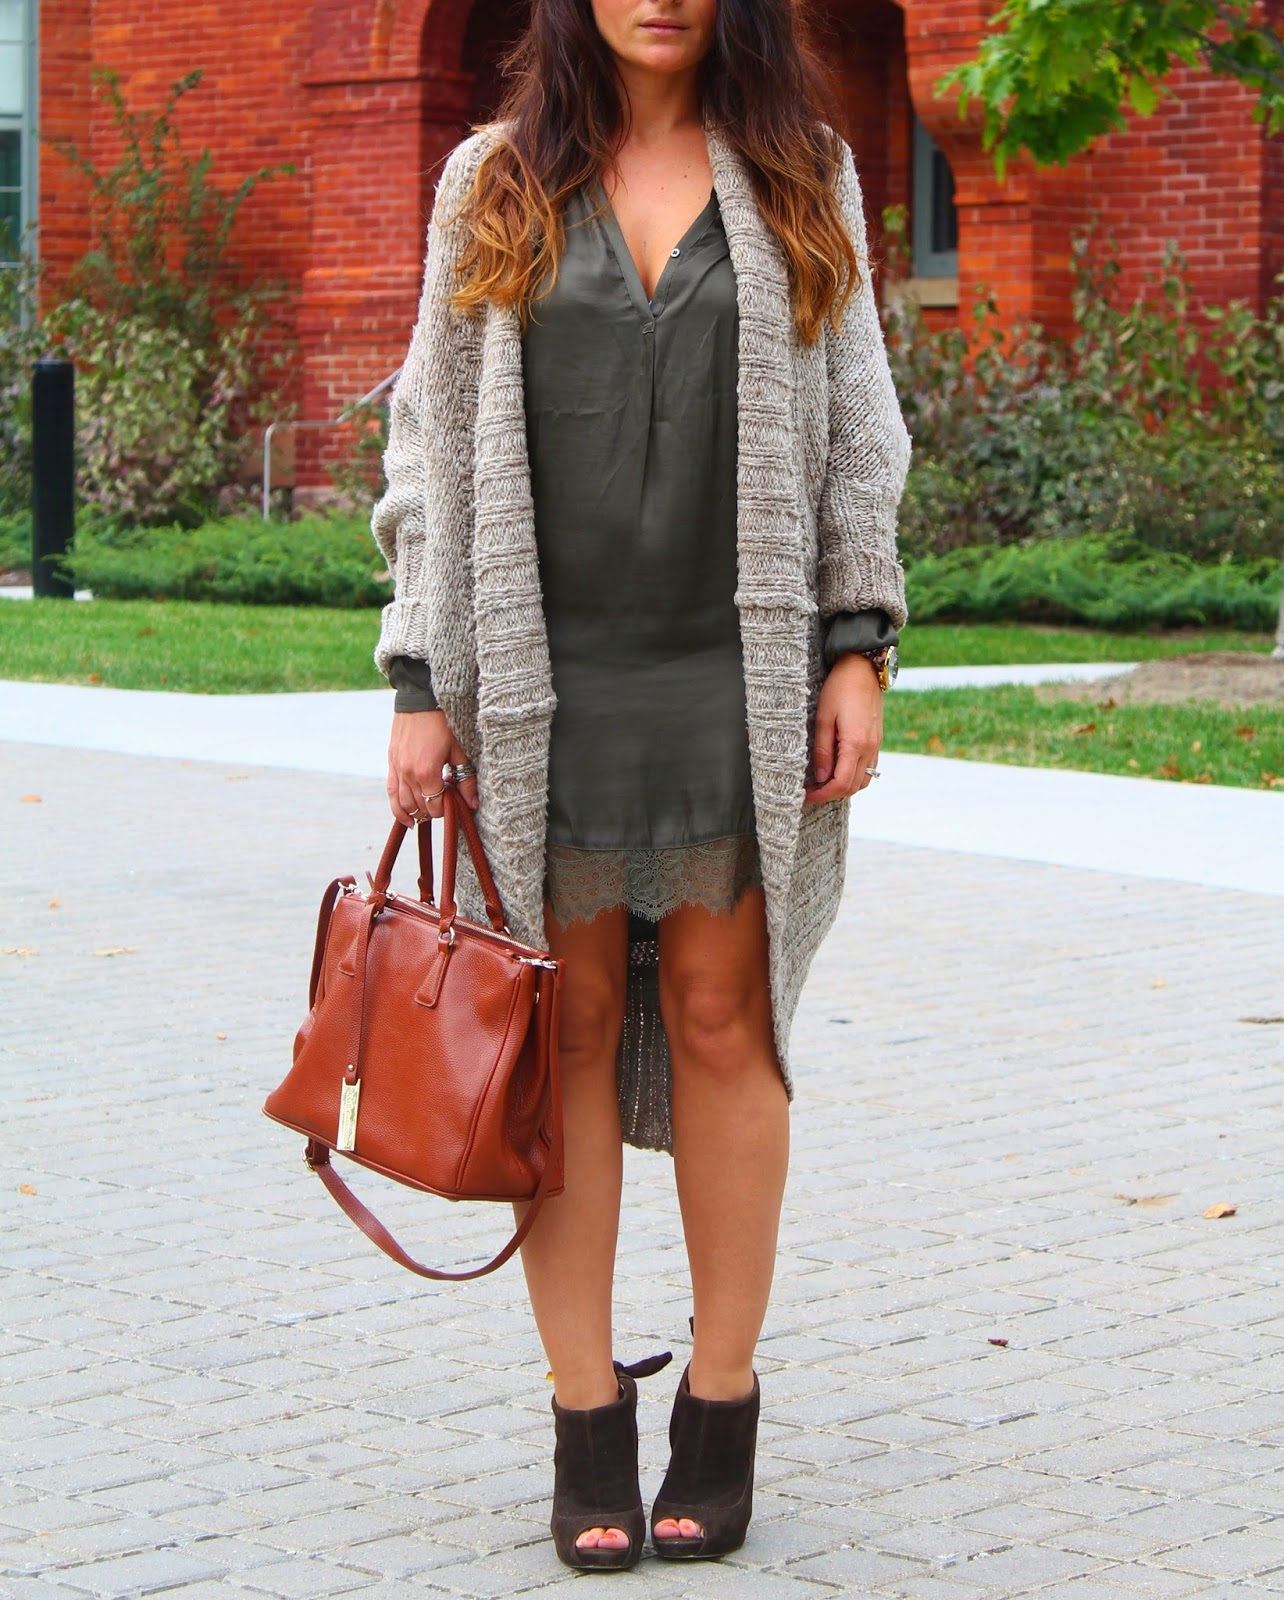 uk blogger, Fall outfit, silk dress, oversized sweater, olive green dress, toronto street style, blogerke, jesenja moda, canadian fashion blogger